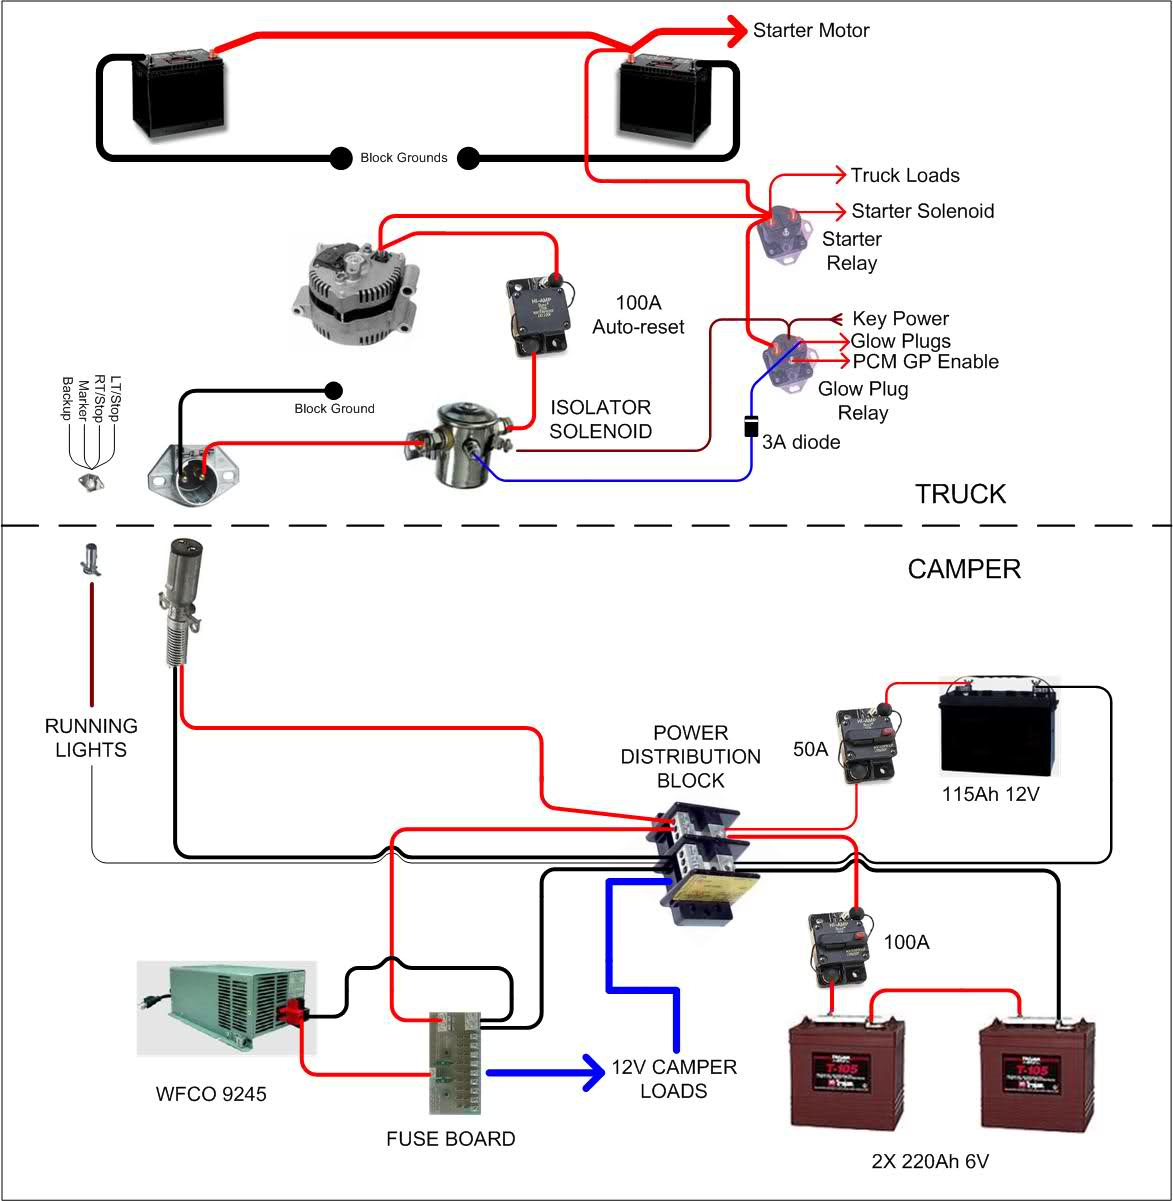 Travel Trailer Converter Wiring Diagram | Wiring Diagram - Travel Trailer Wiring Diagram